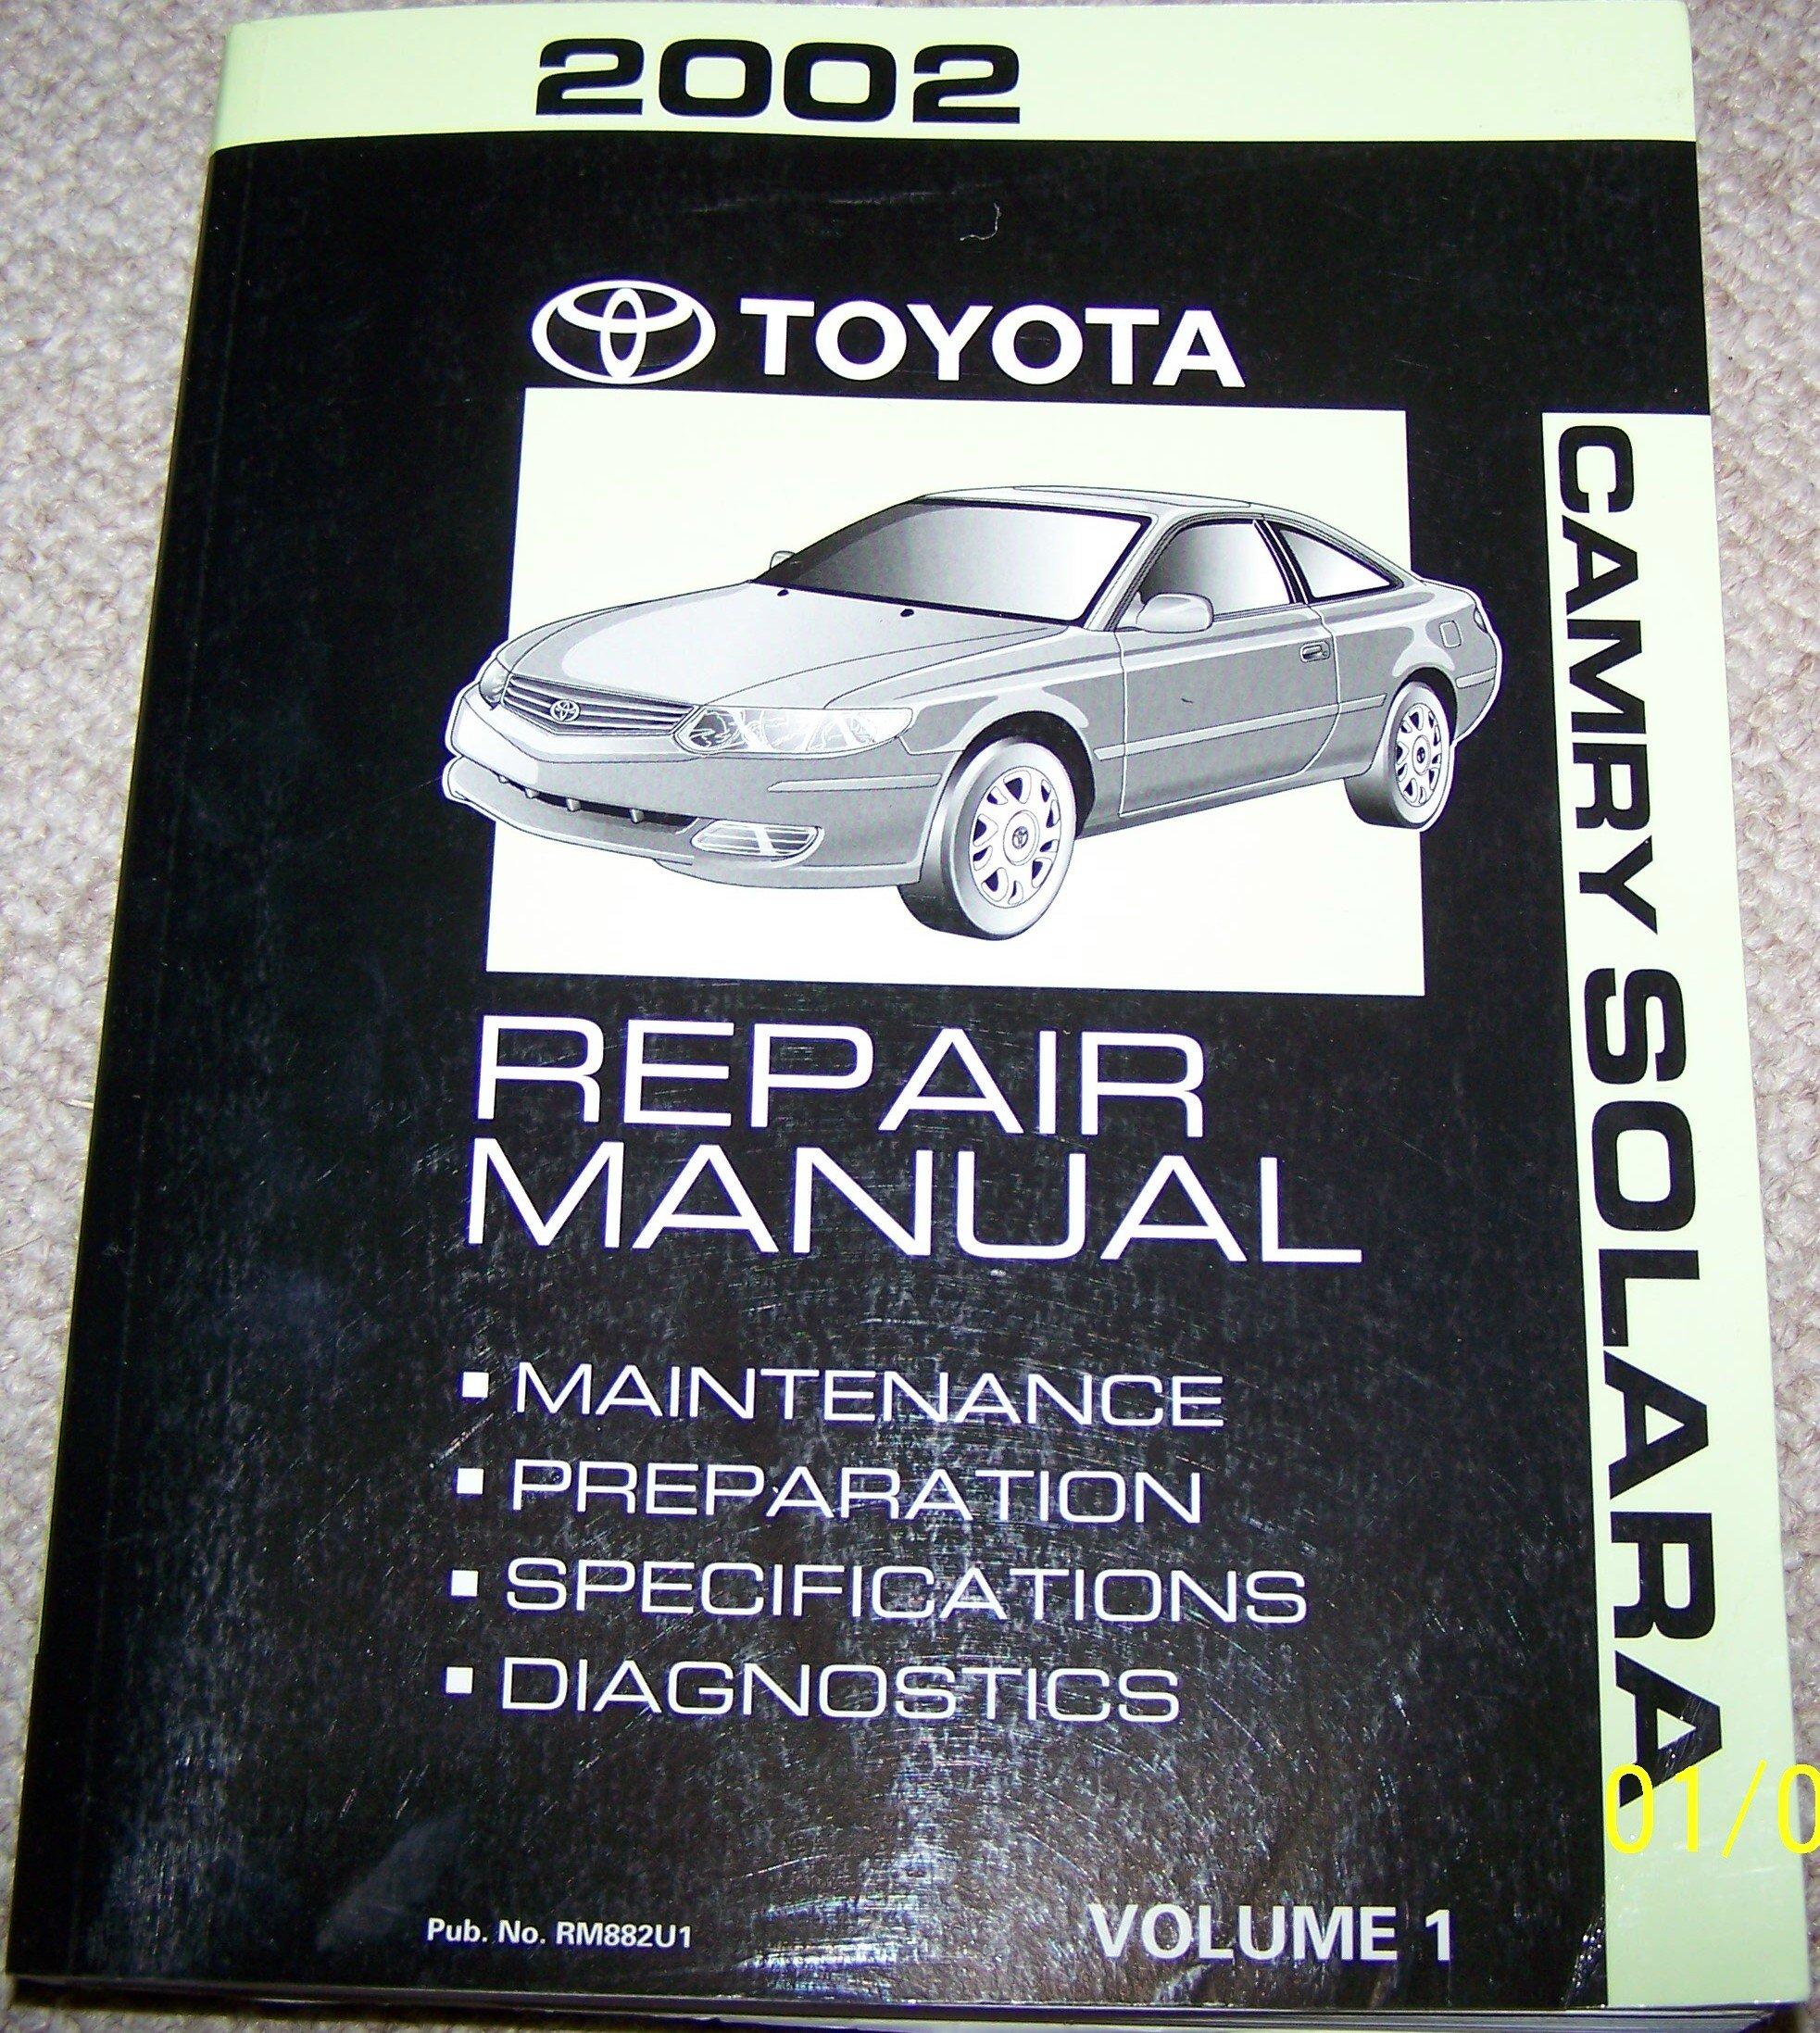 2002 Toyota Camry Solara Repair Manual (Volume 1): Toyota Motor Corp:  Amazon.com: Books